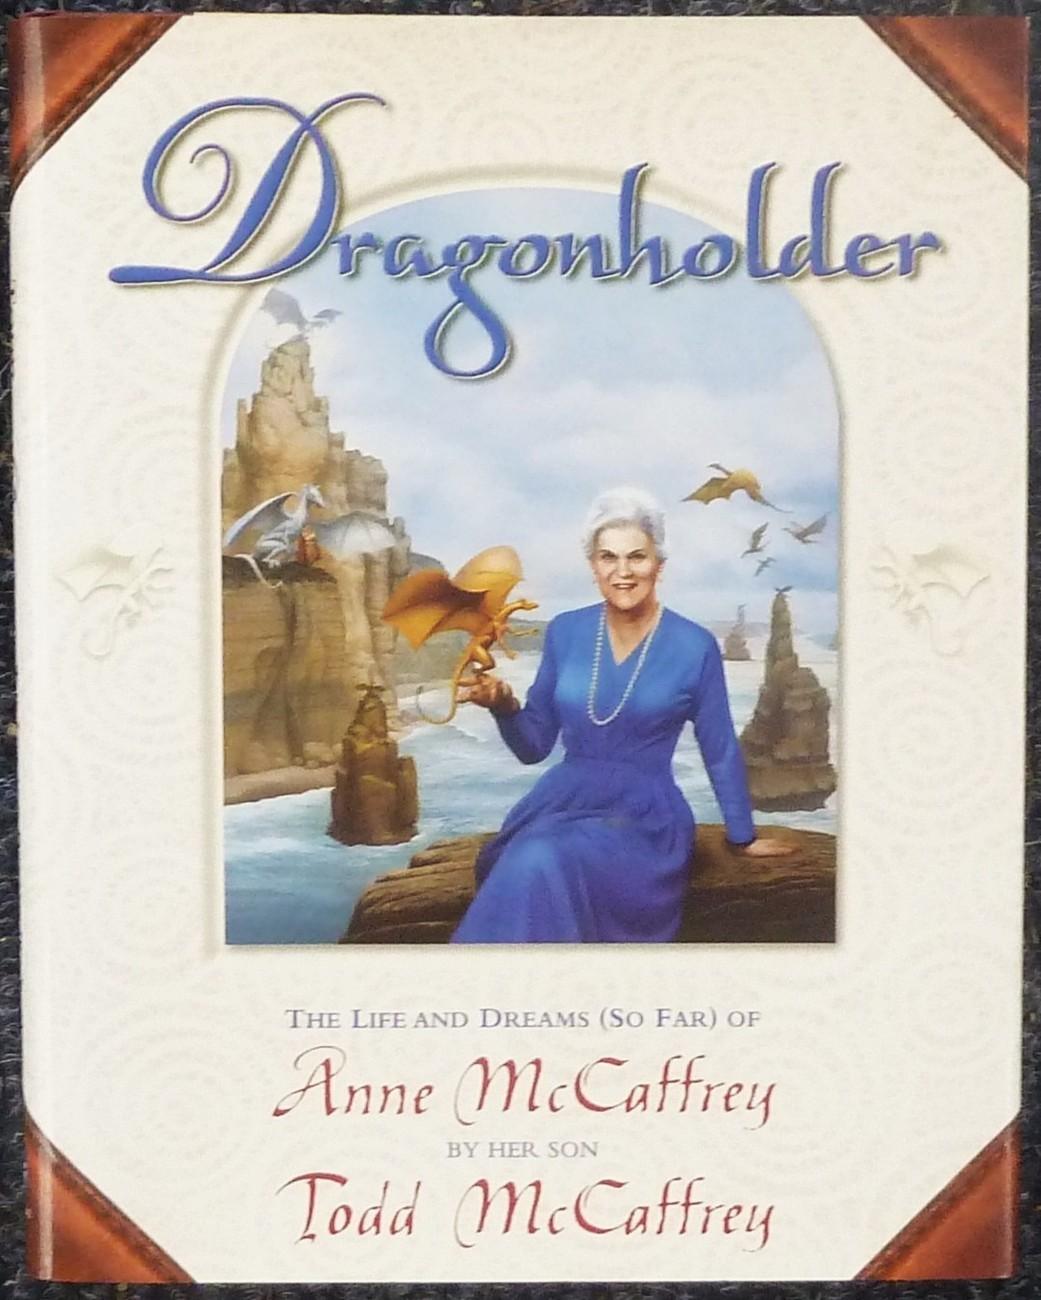 Dragonholder by Todd McCaffrey